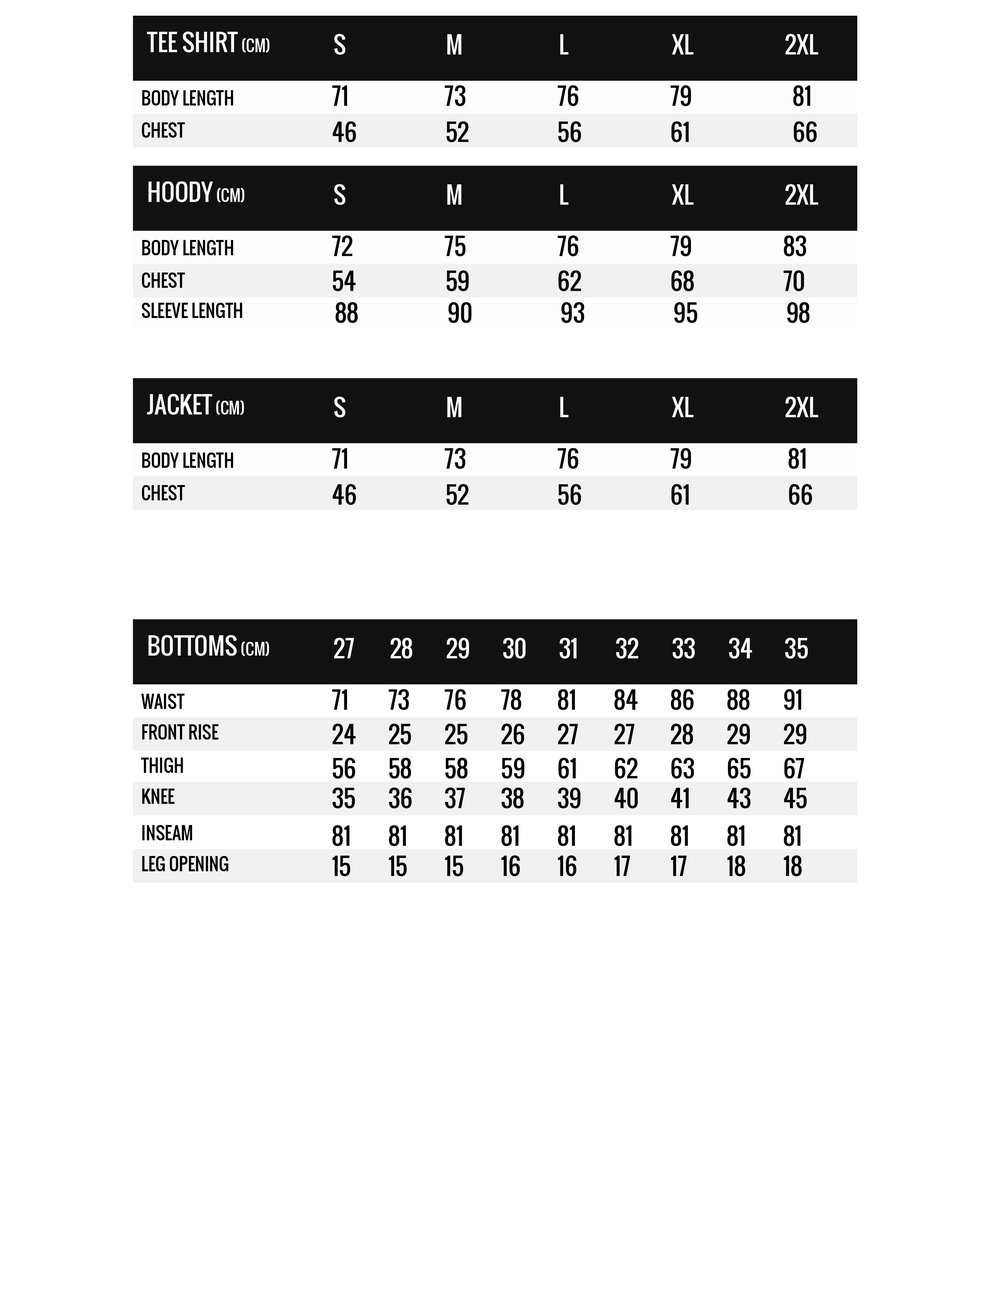 Size Chart 10.28.17 test 1 copy.jpg